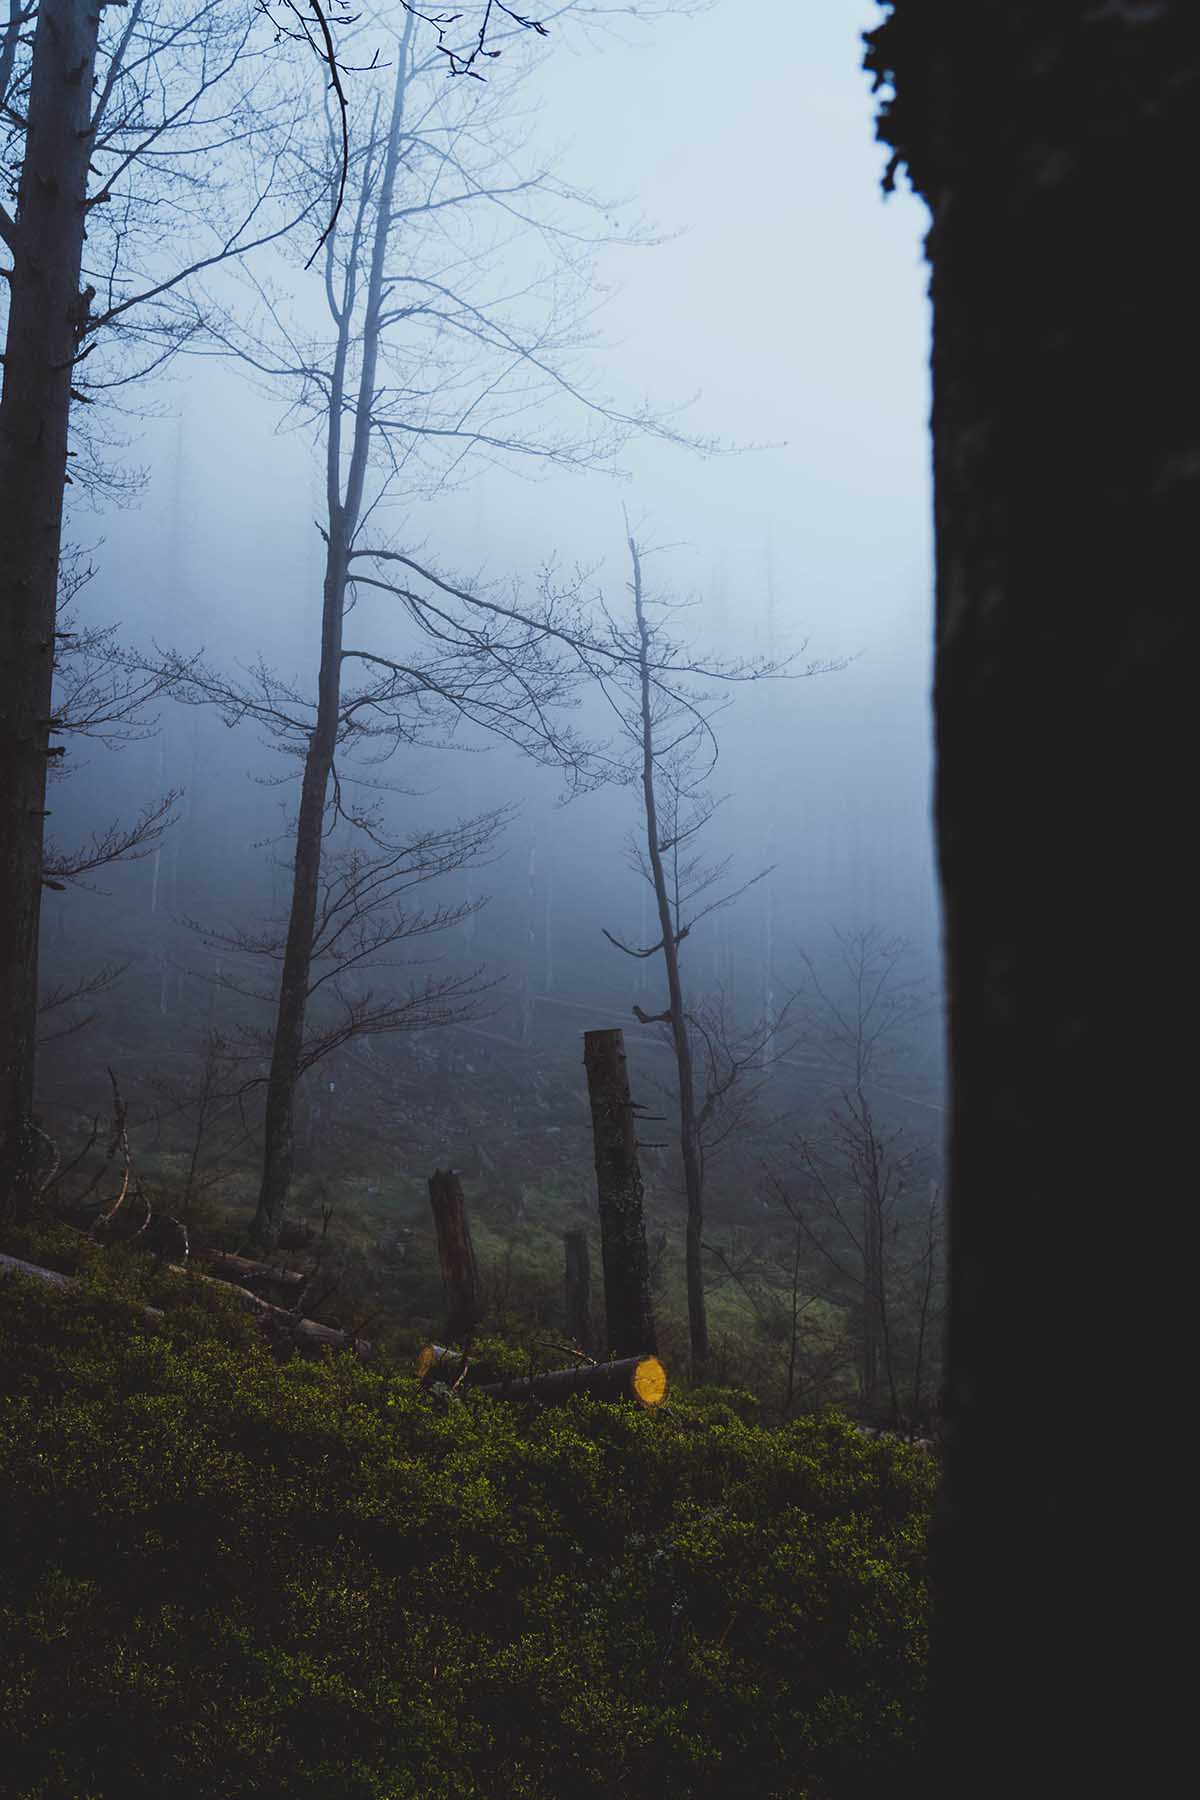 schachtenwanderung-nebel